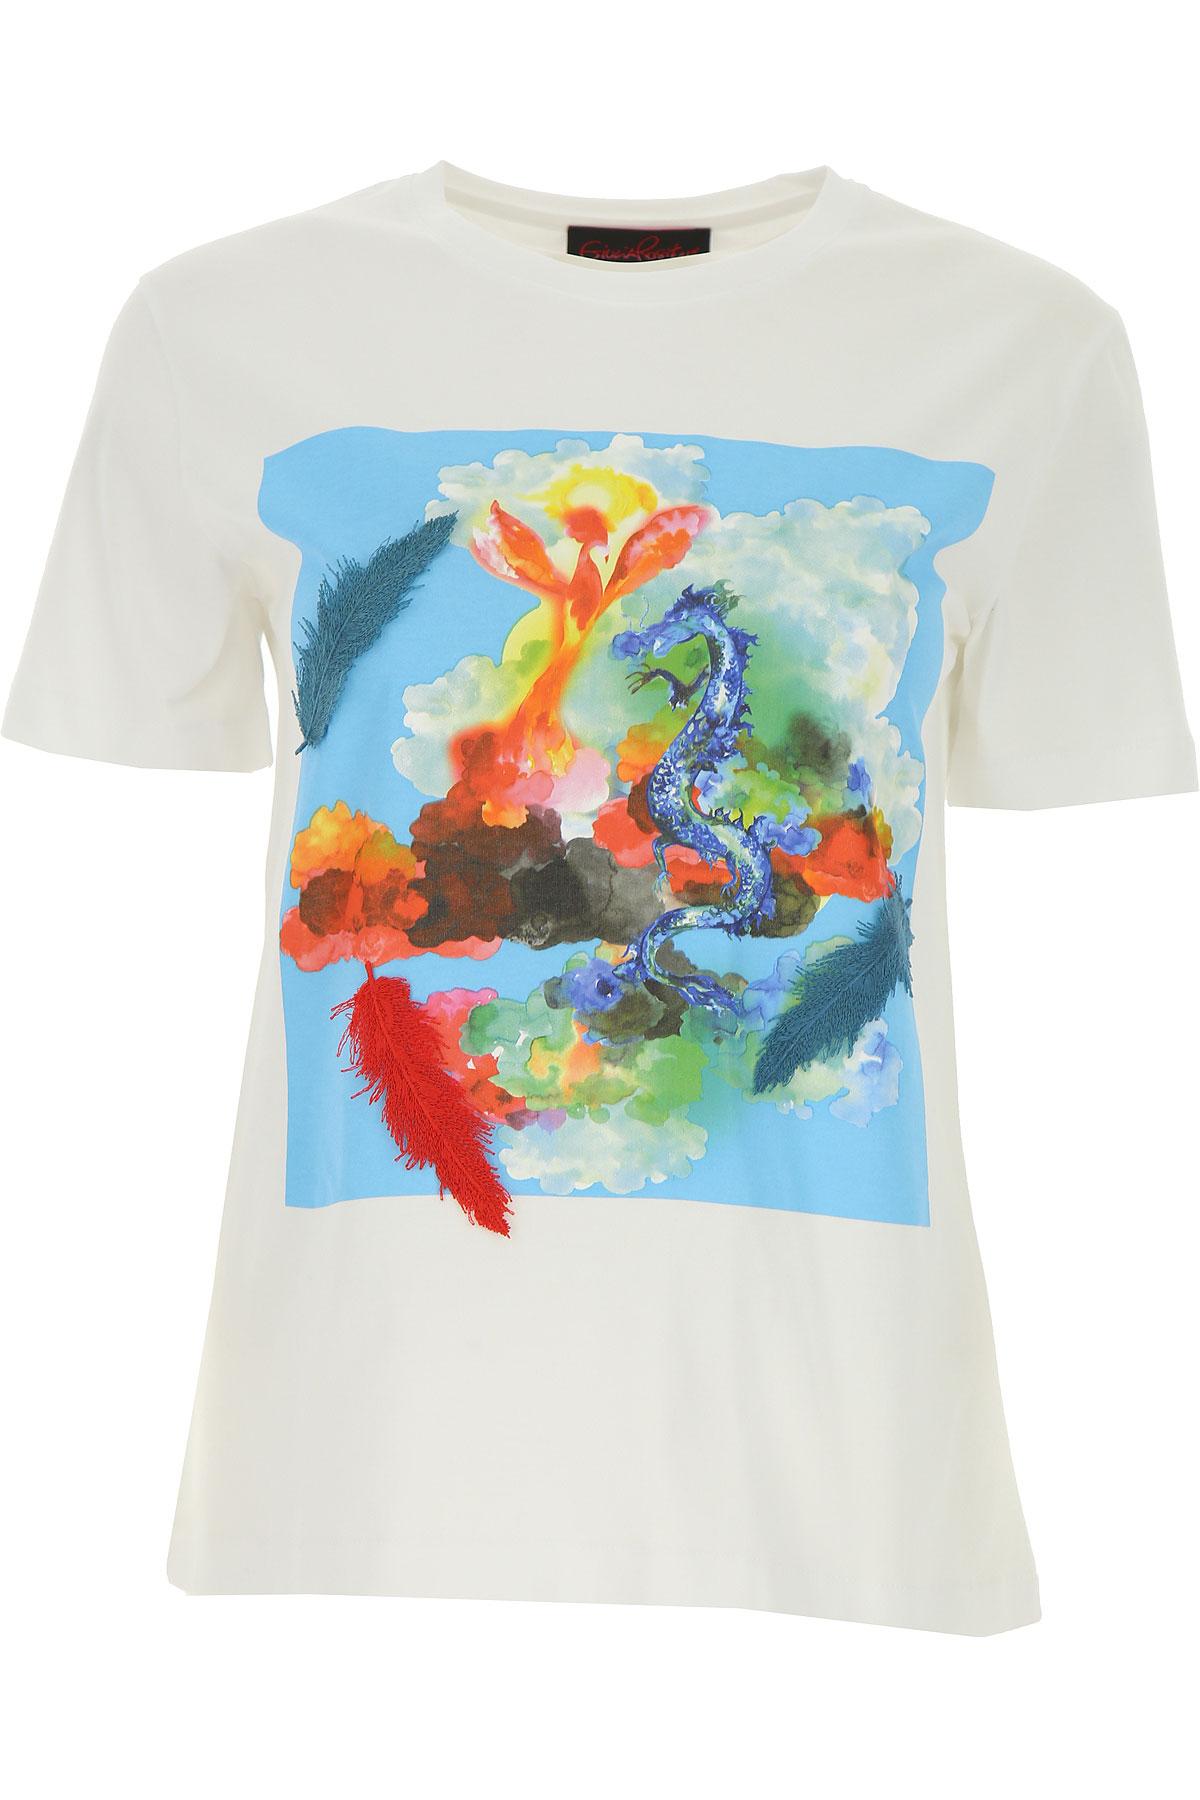 Giulia Rositani T-shirt Femme, Blanc, Coton, 2017, 40 44 M